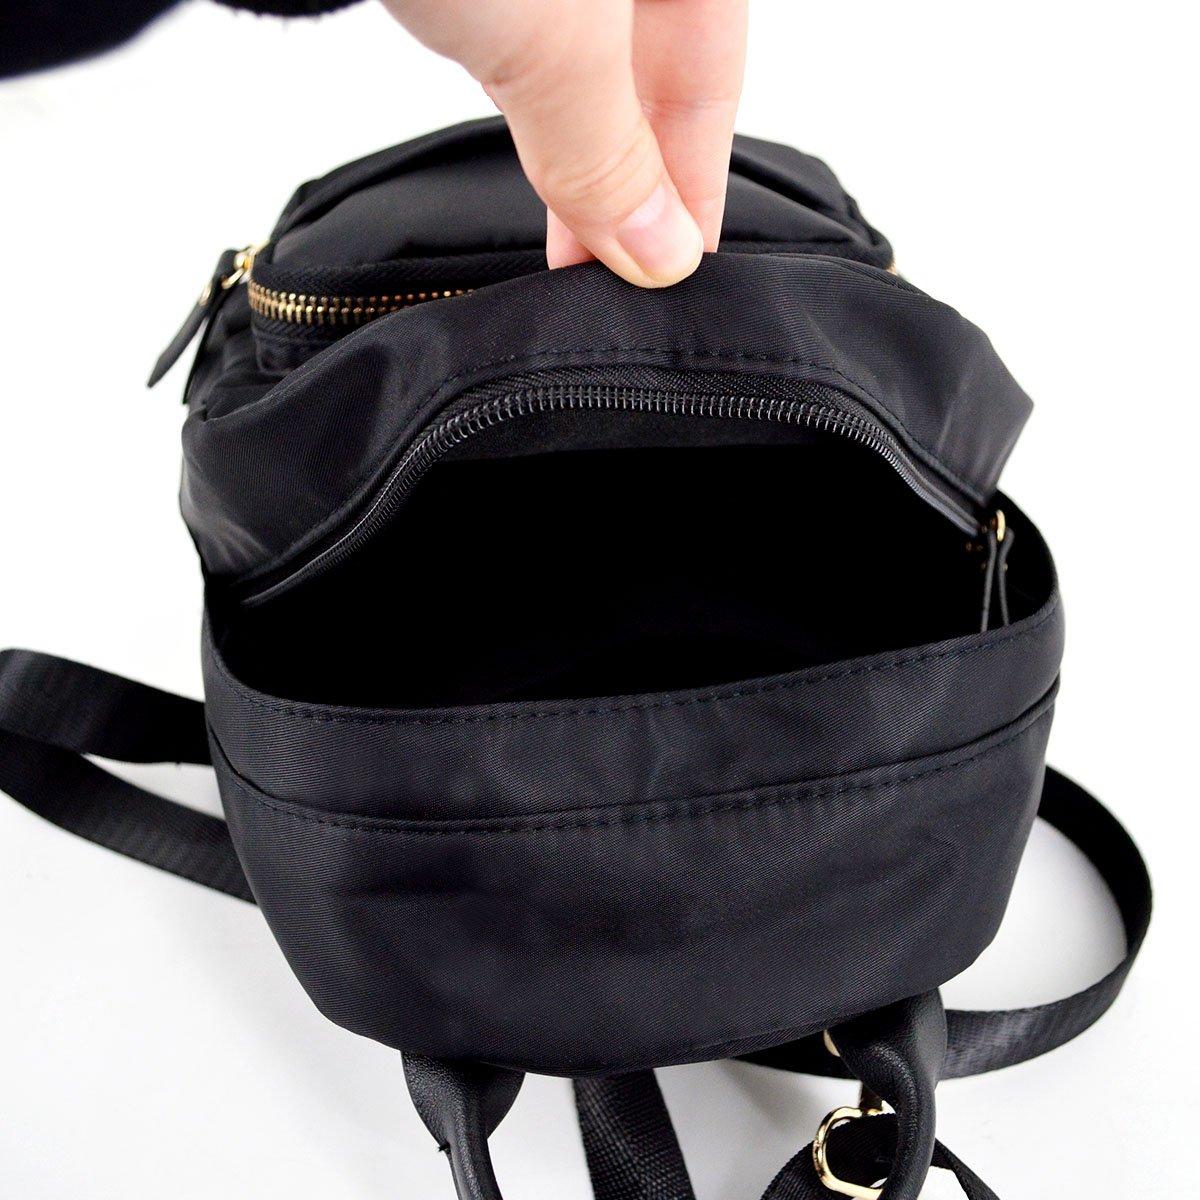 abee151d097a Amazon.com  CLARA Camouflage Women Mini Backpack Nylon Leisure Daypack  Printed Shoulder Bag Handbag Purse(Black)  Shoes